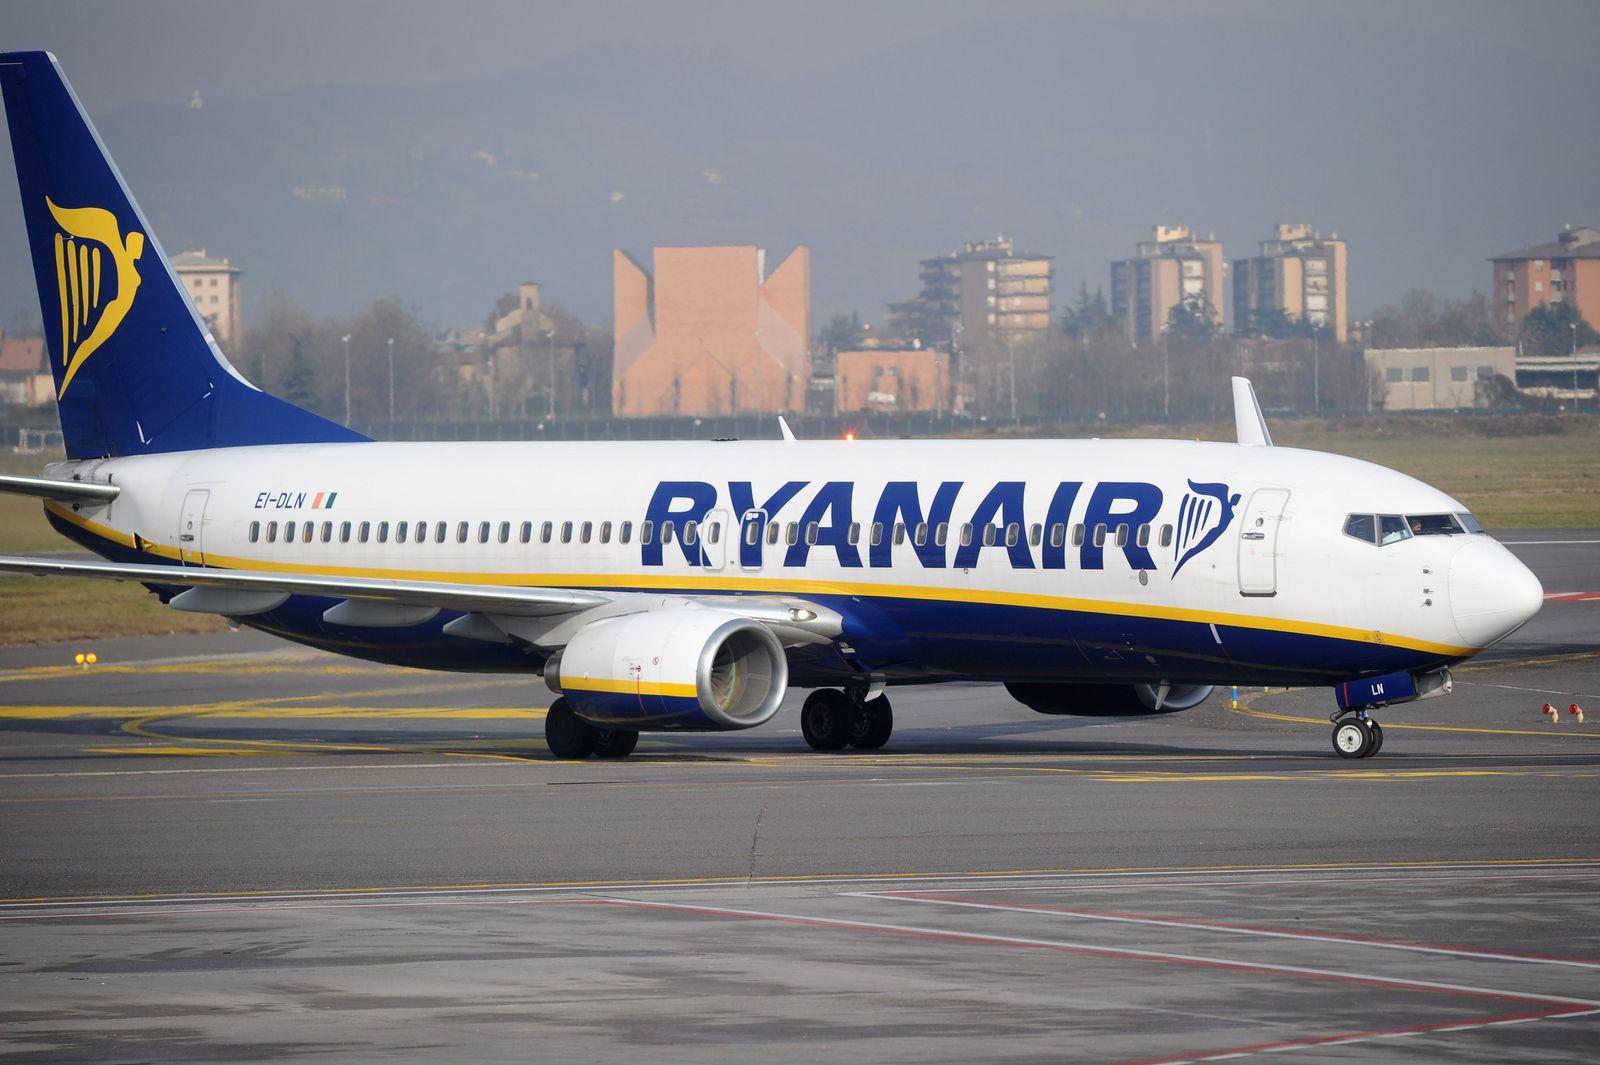 Ryanair / Flugzeug / Italien